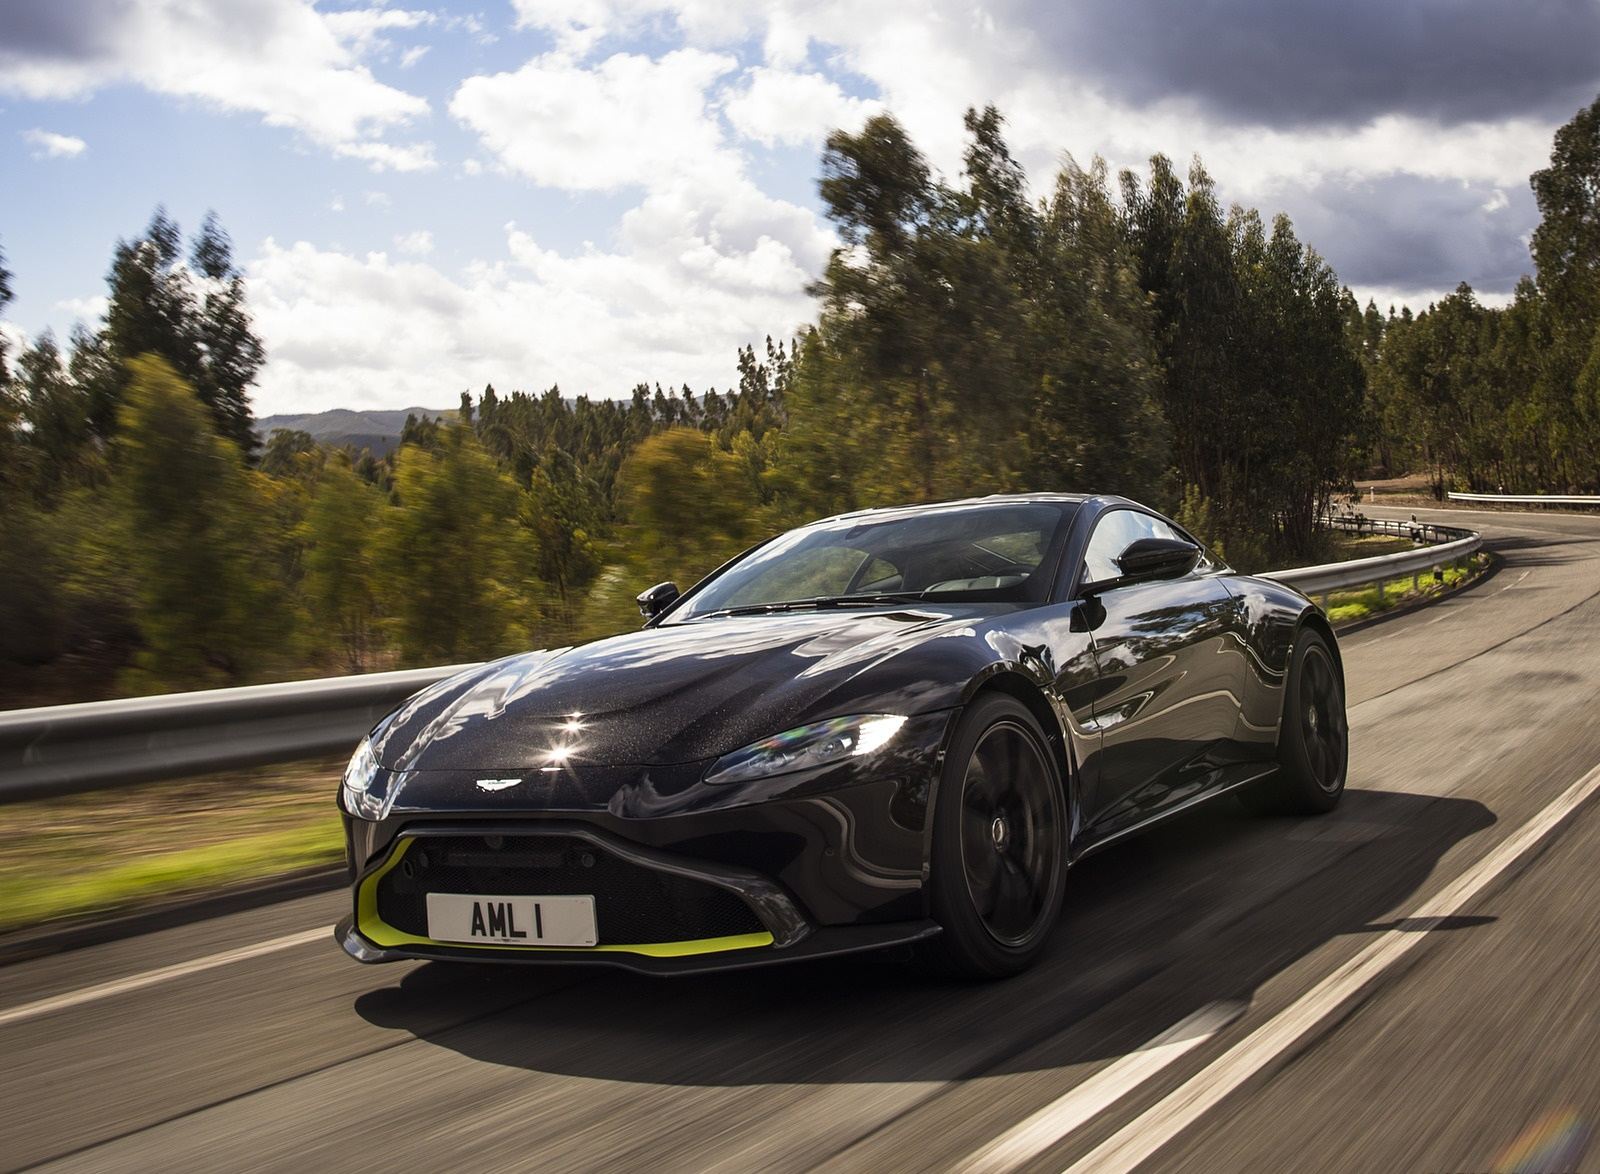 2019 Aston Martin Vantage (Onyx Black) Front Three-Quarter Wallpapers (3)